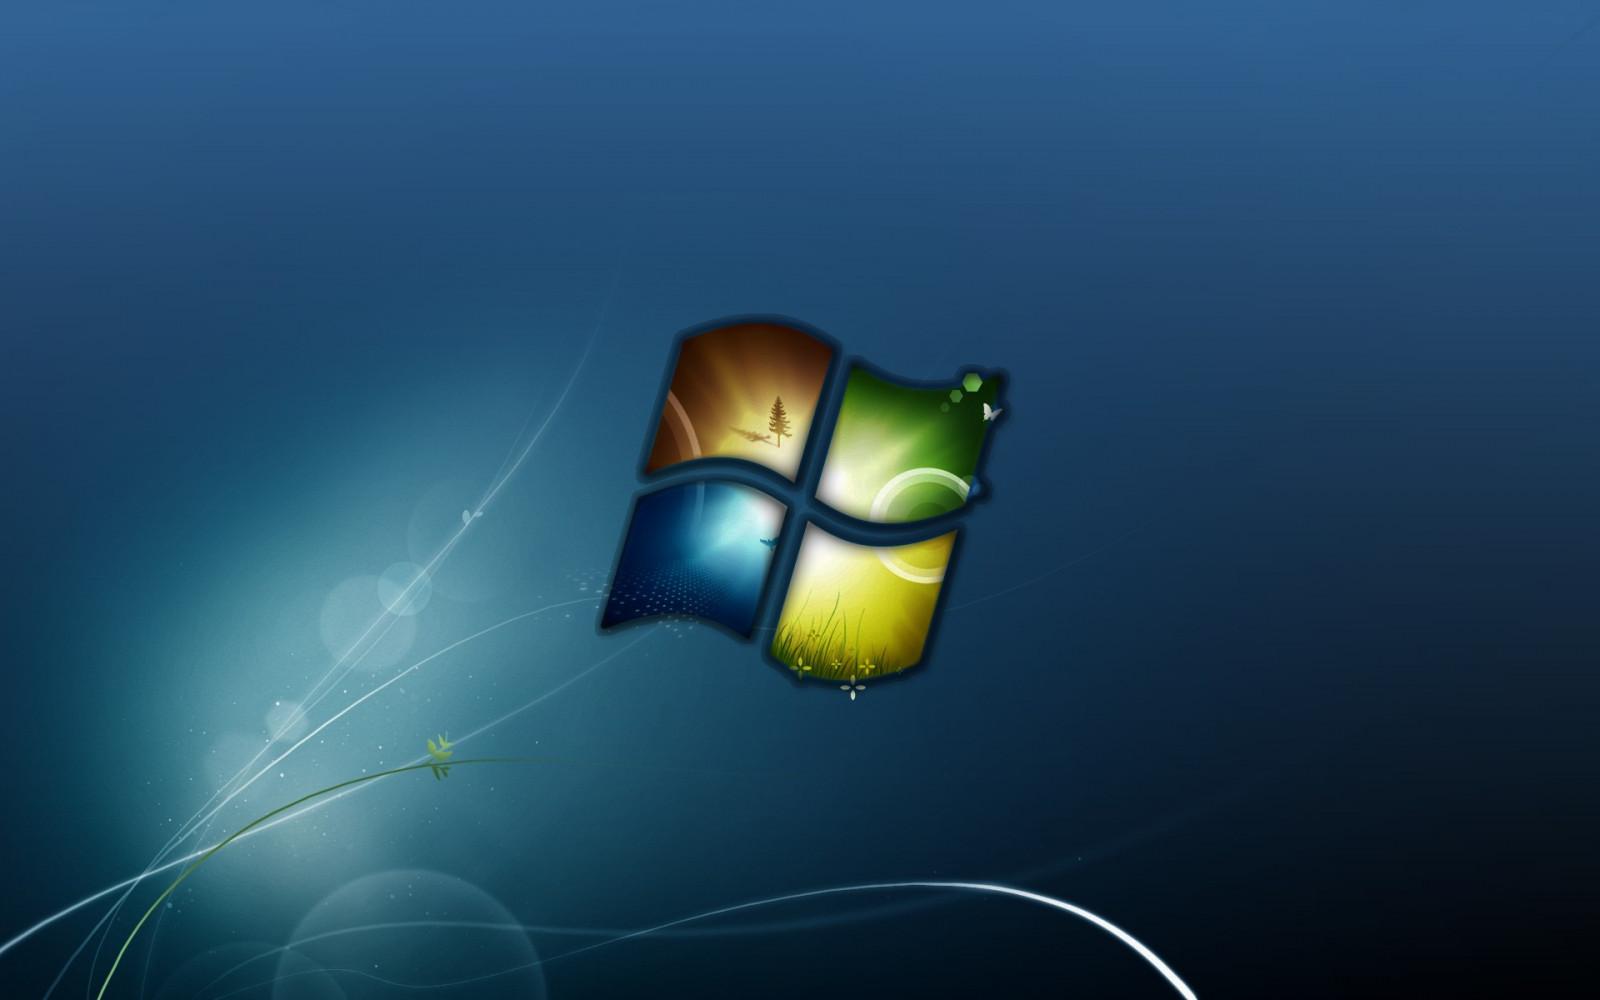 1920x1200 px, Microsoft Windows